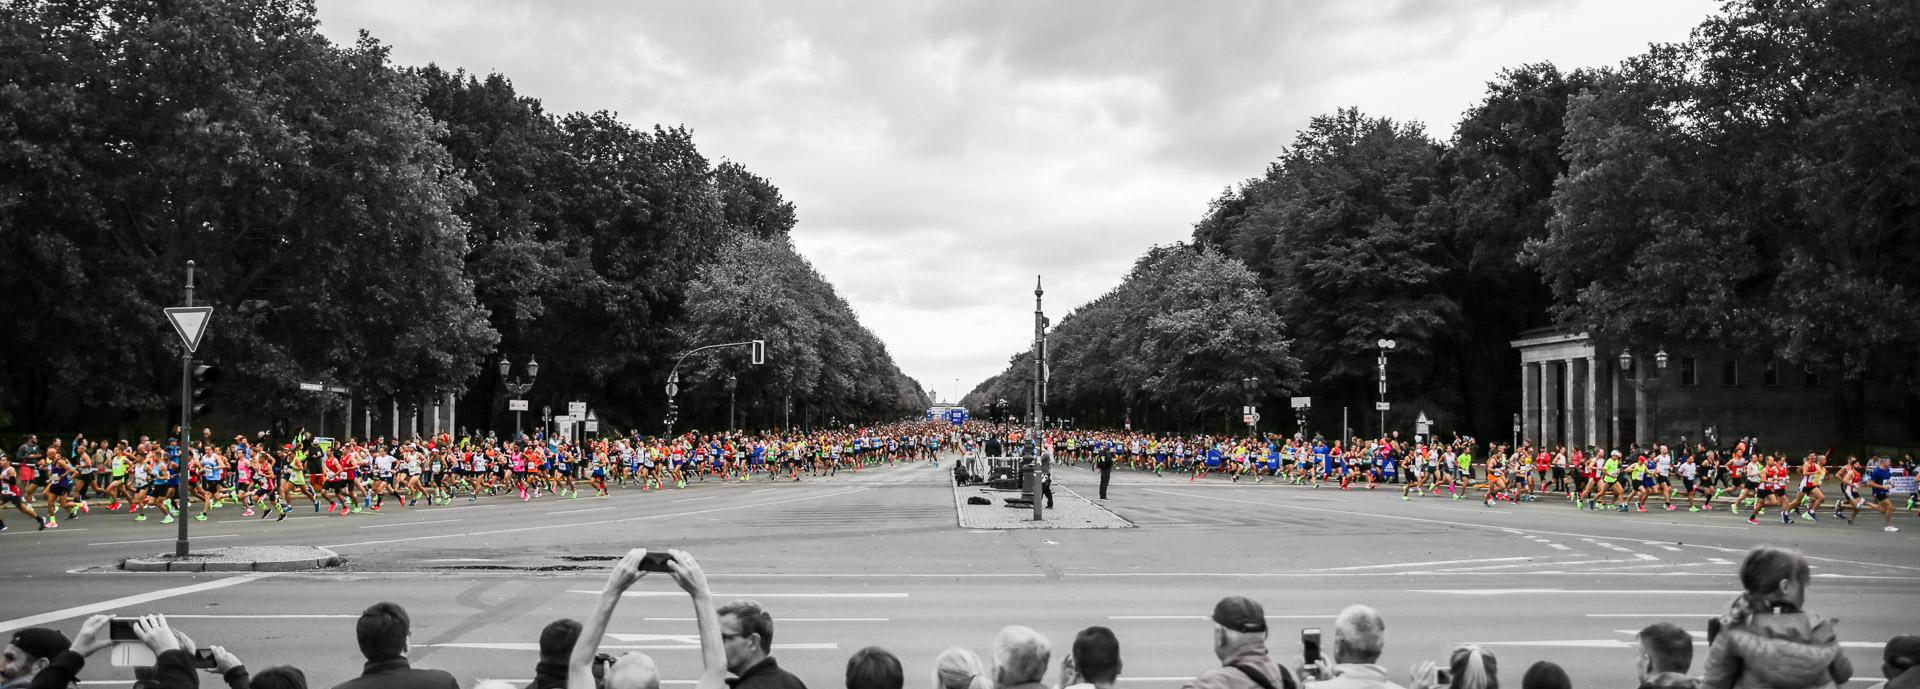 Sportsphotography by BikeBlogBerlin